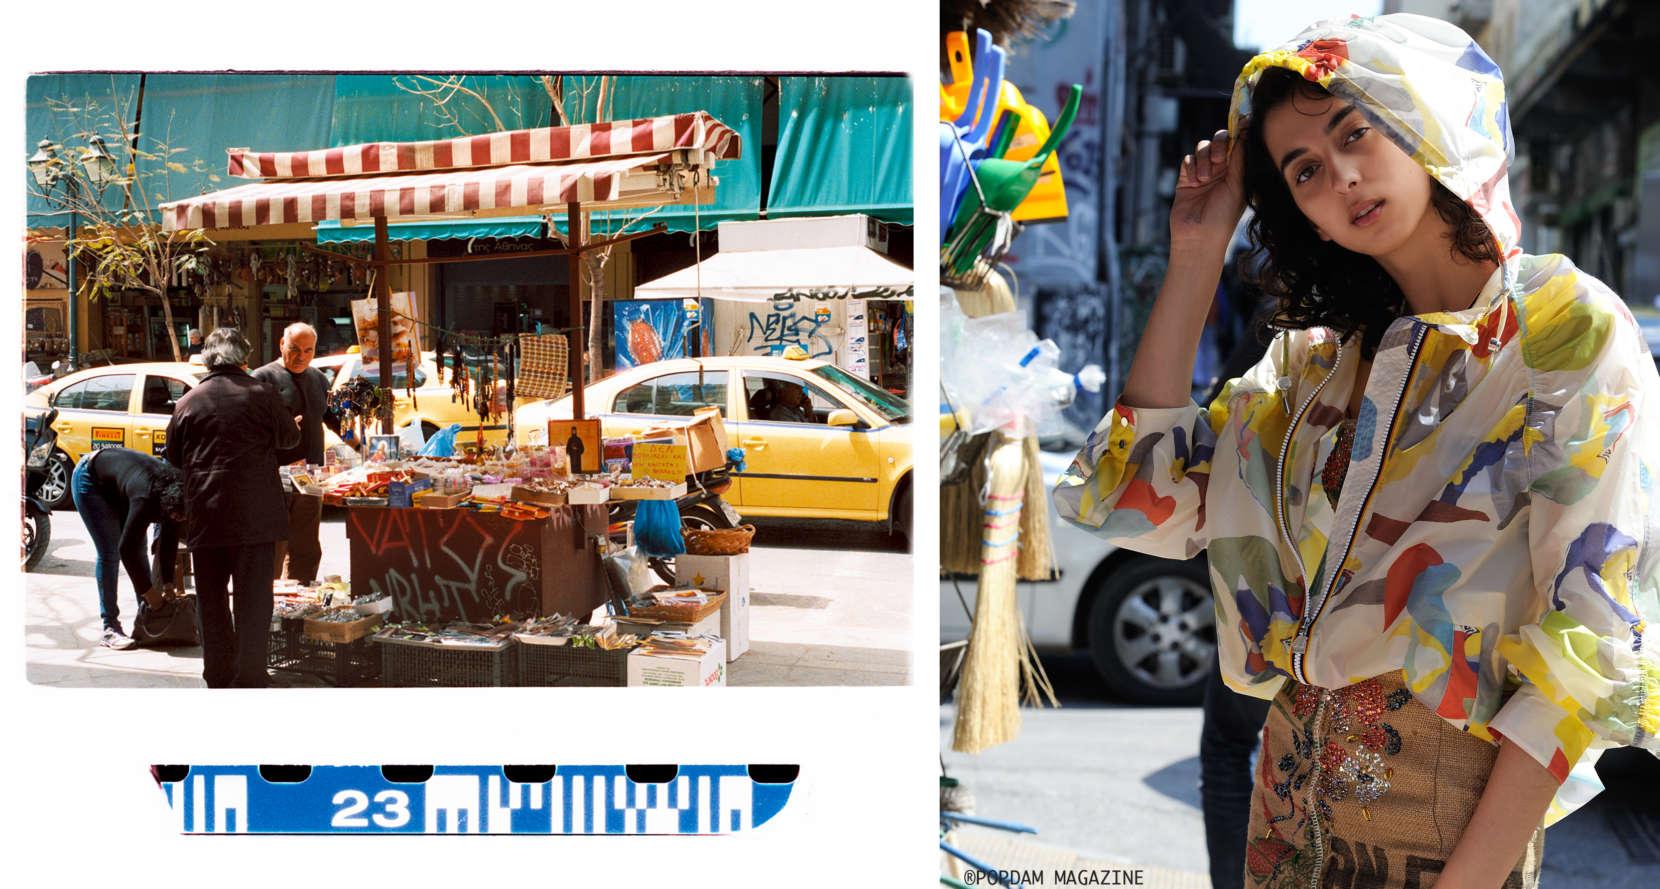 Central-Market-04-1660x889.jpg